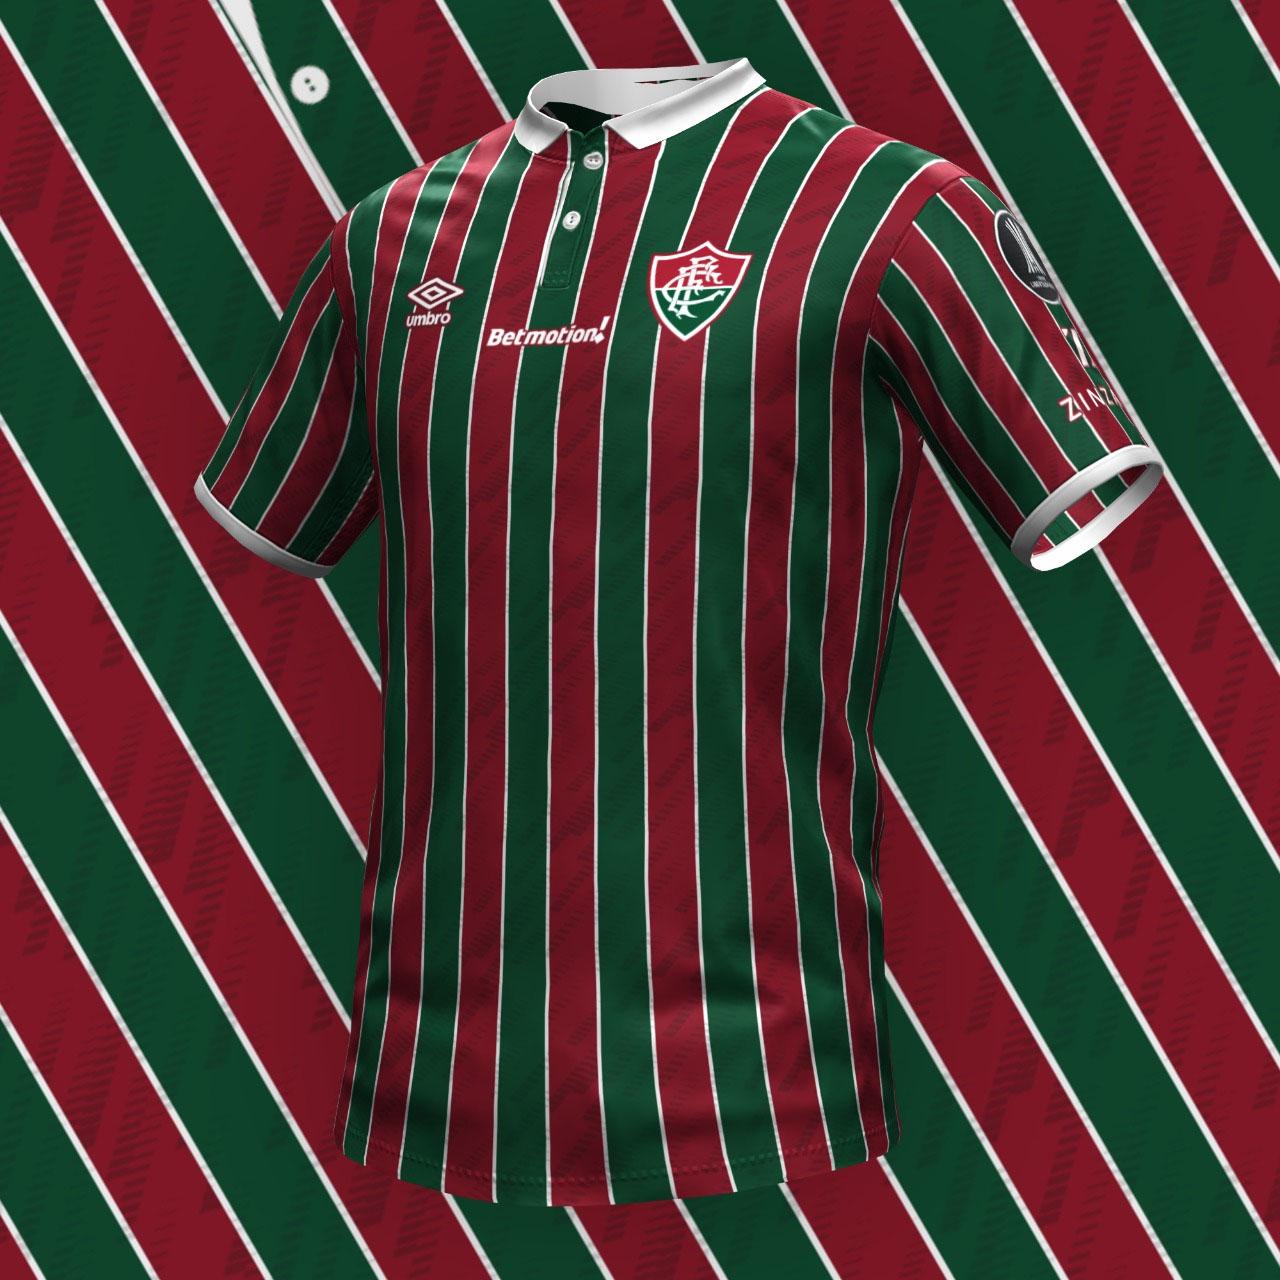 Mockup da Suposta Camisa do Fluminense 2021